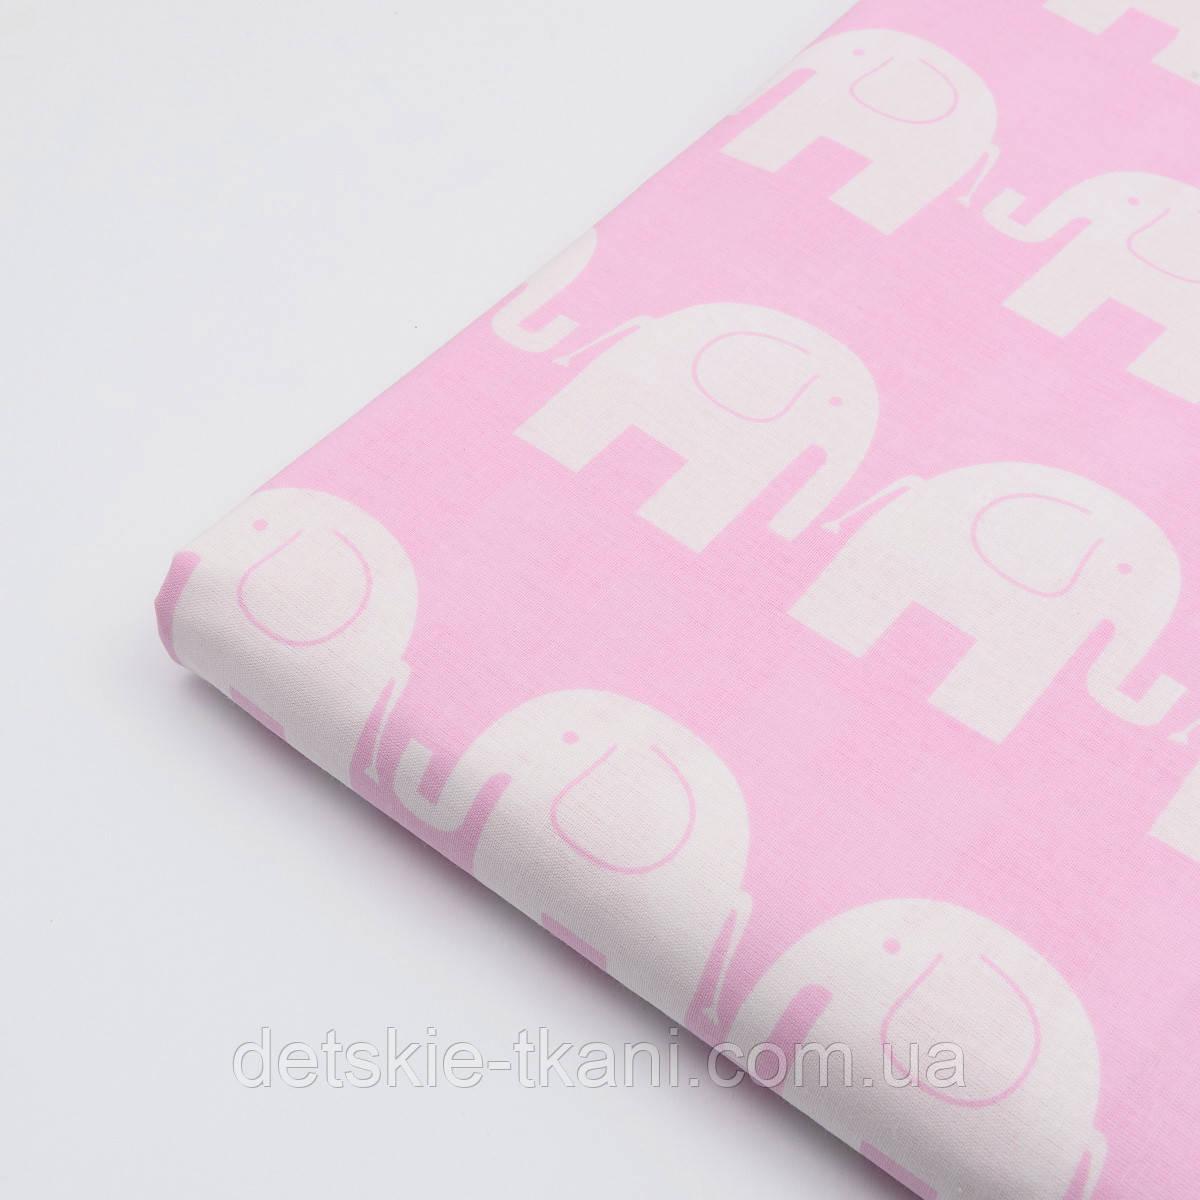 Лоскут ткани №67  слоны на розовом фоне, размер 43*84 см